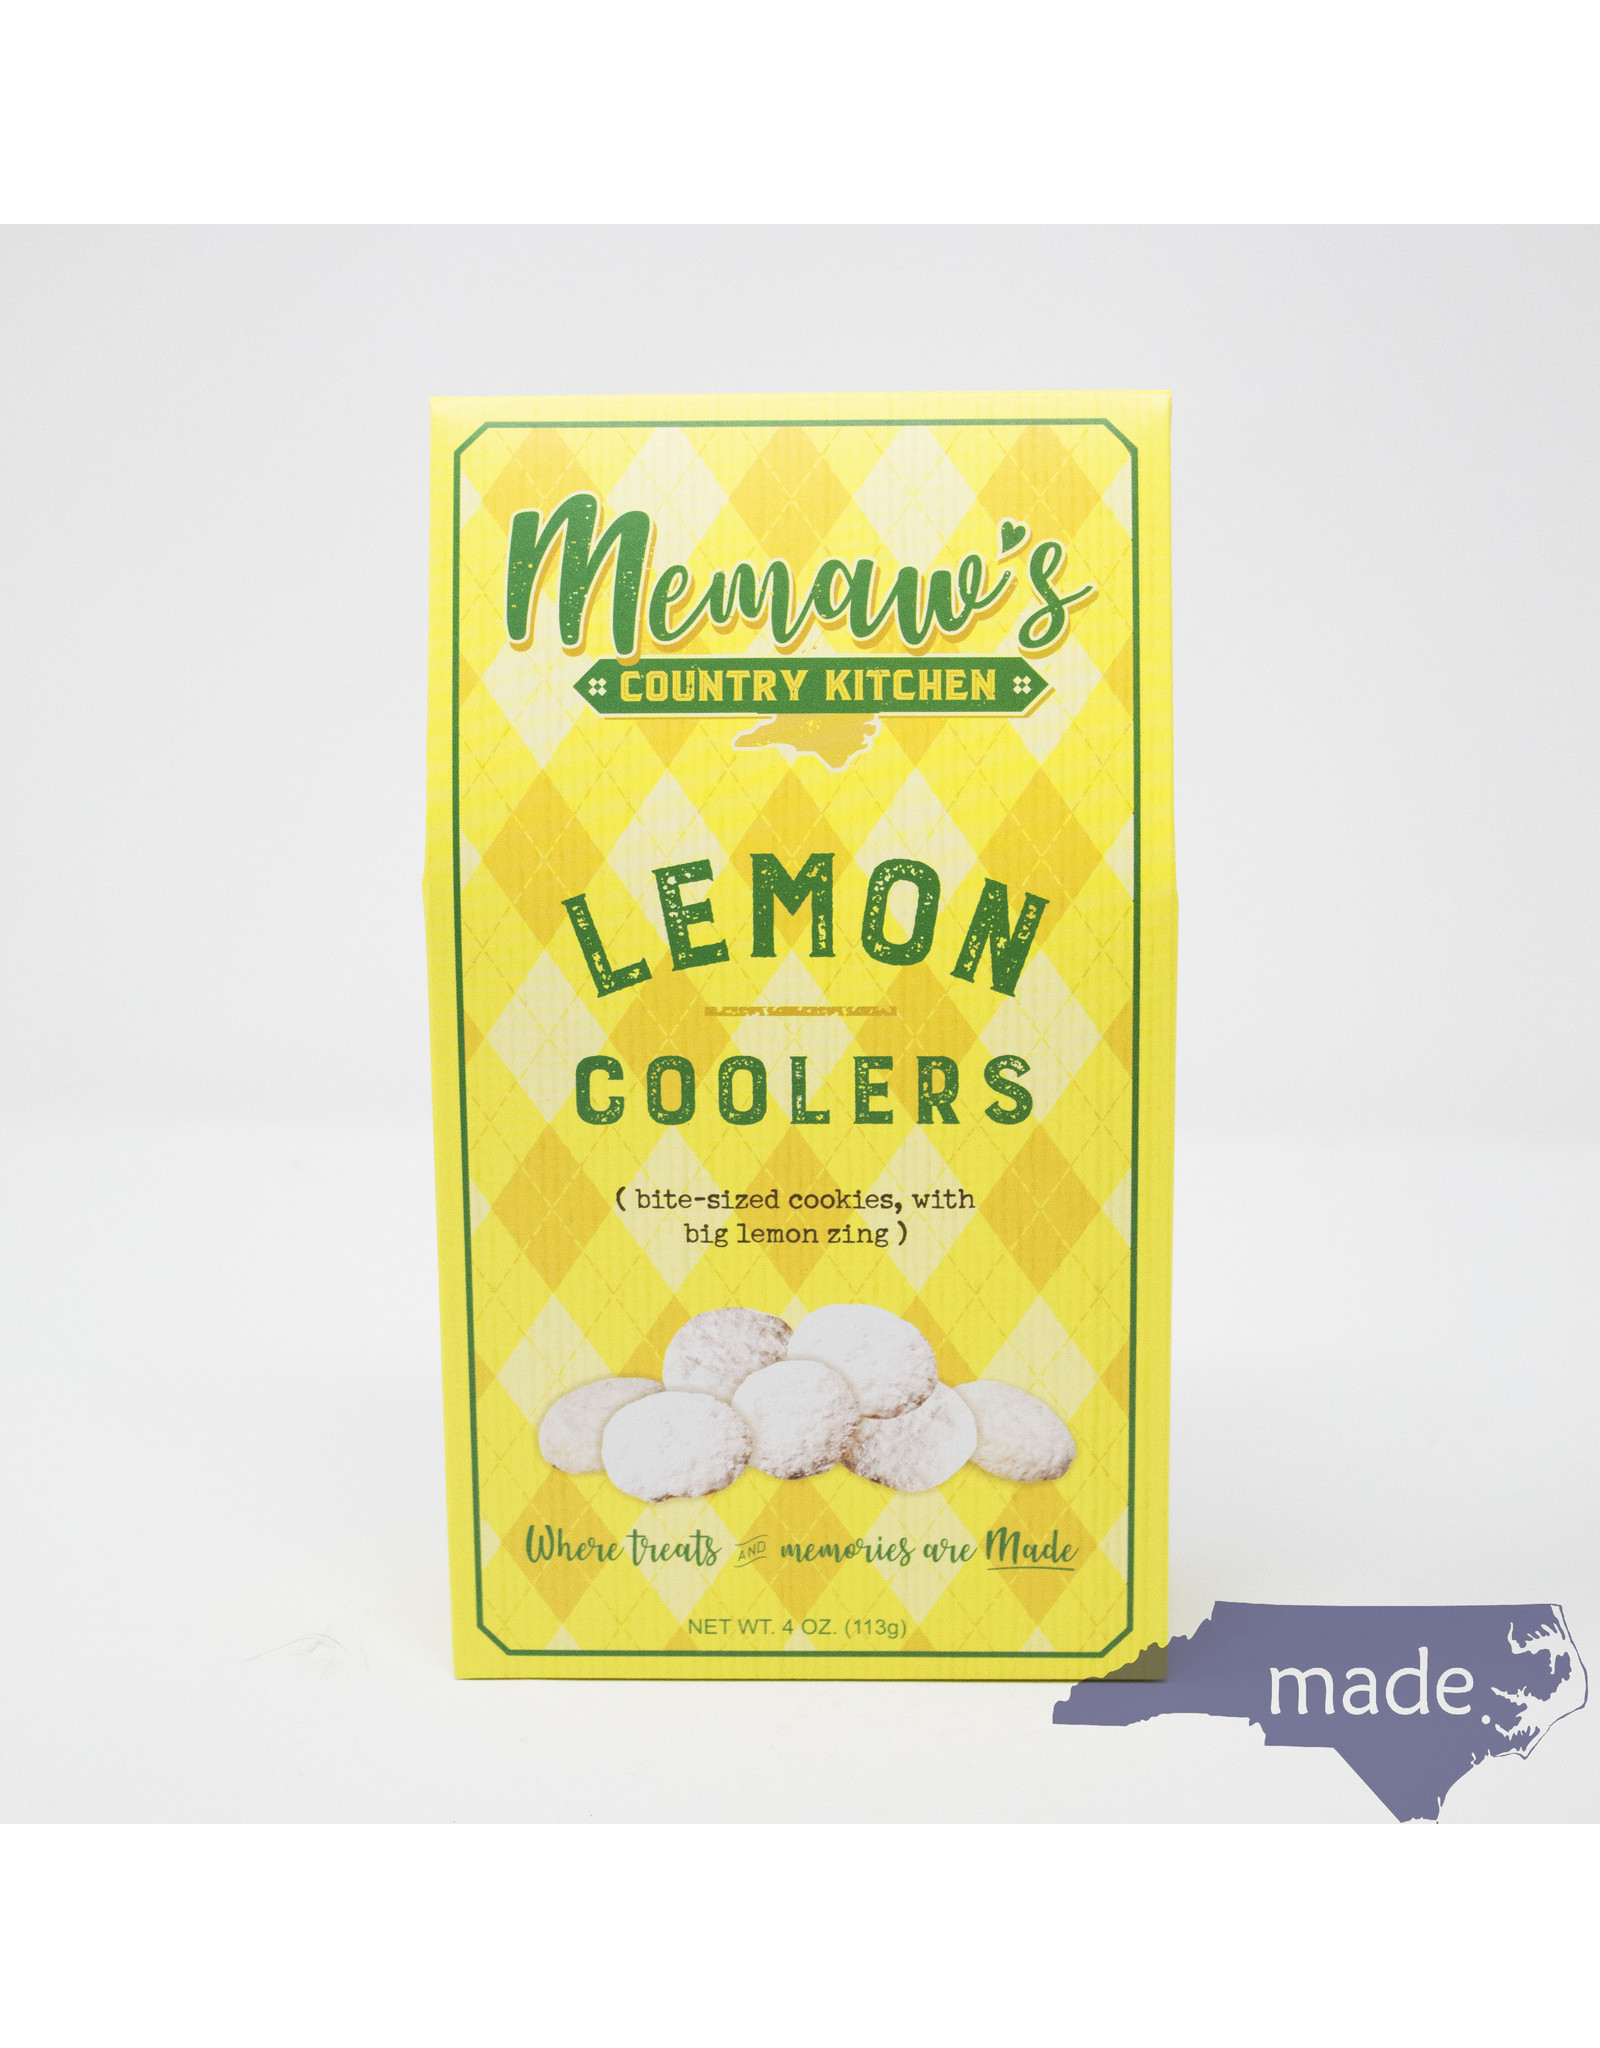 1 in 6 Snacks Lemon Coolers - Memaw's